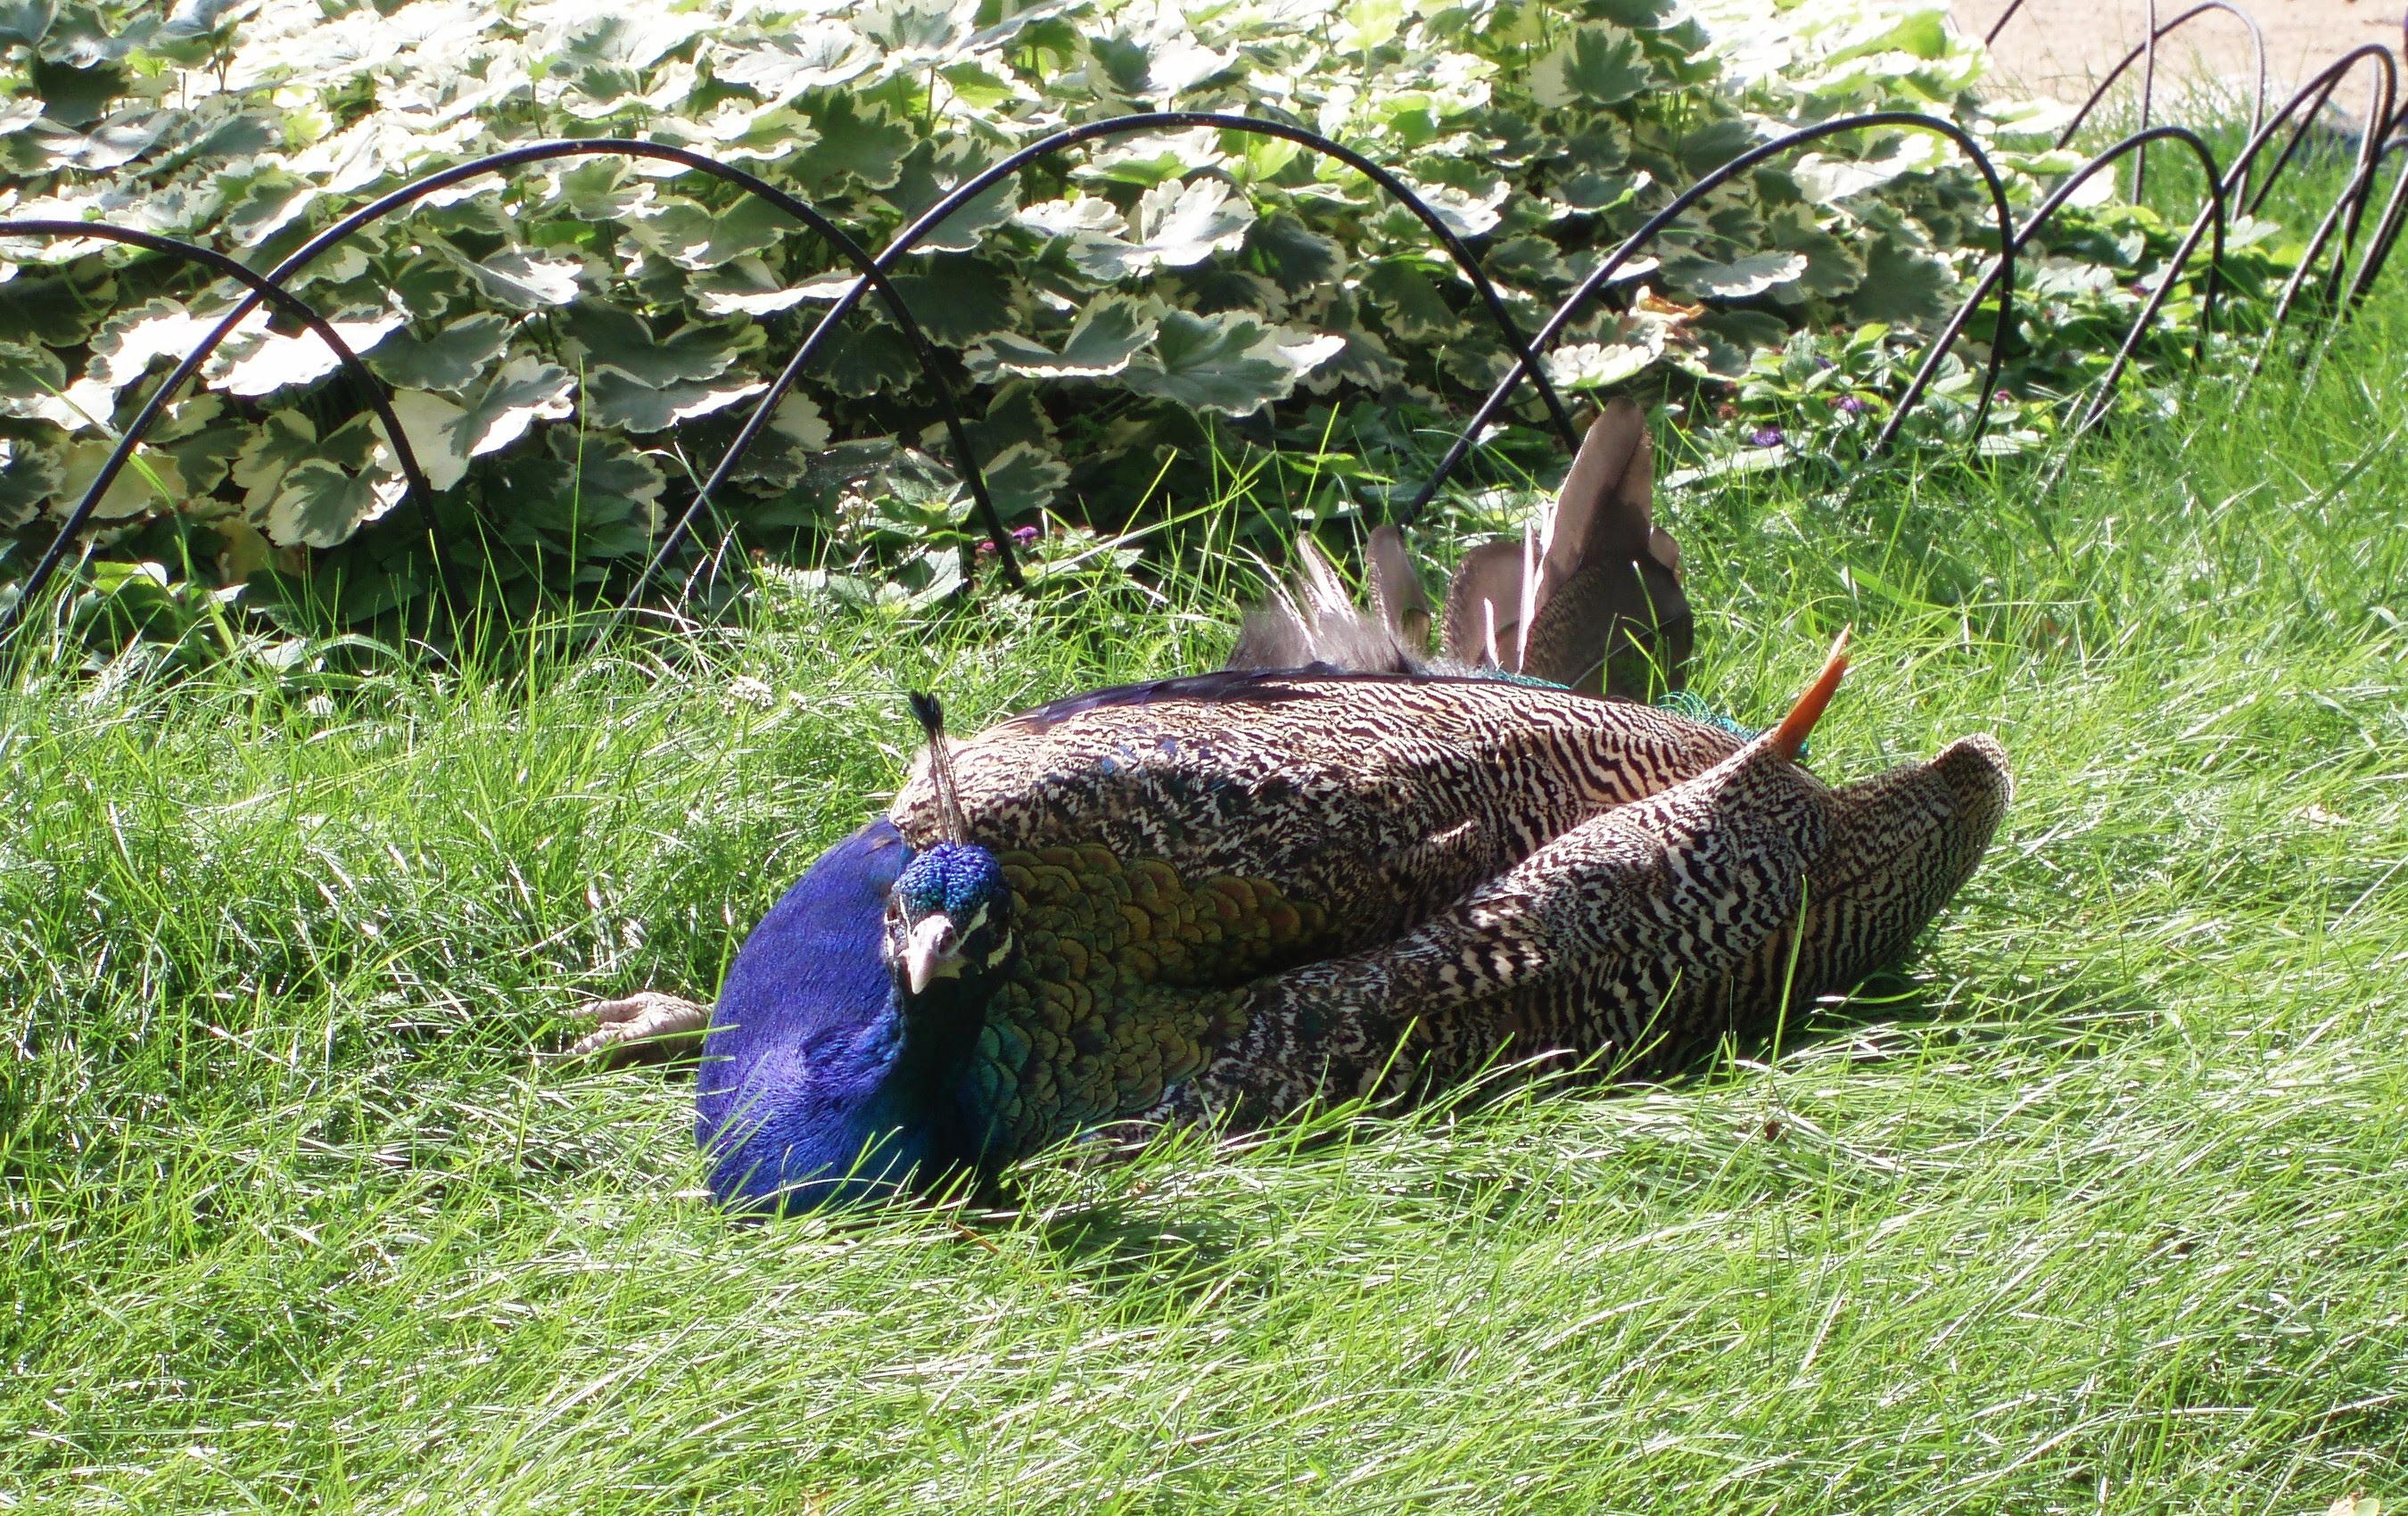 http://upload.wikimedia.org/wikipedia/commons/0/0a/Peacock-male-sunbathing.jpg